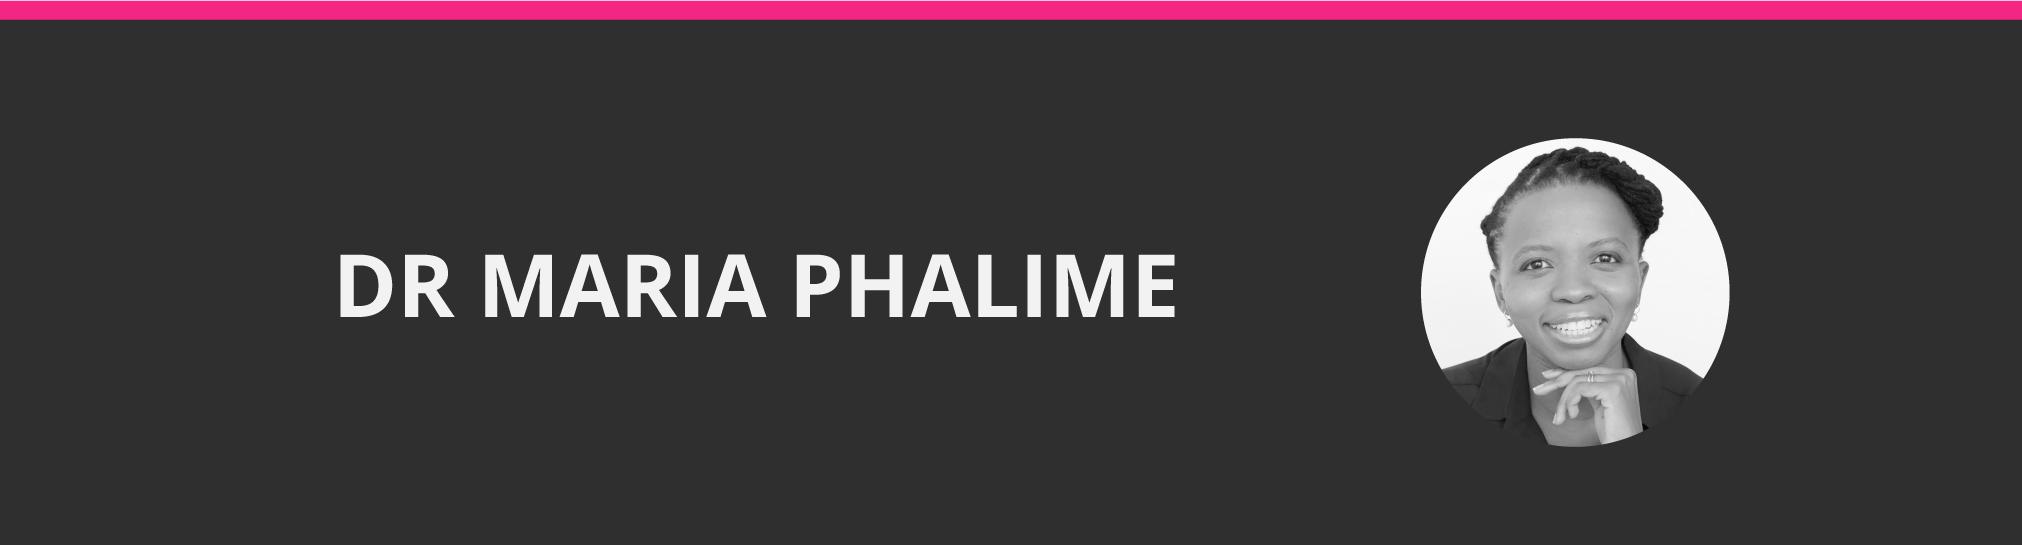 Dr_Maria_Phalime